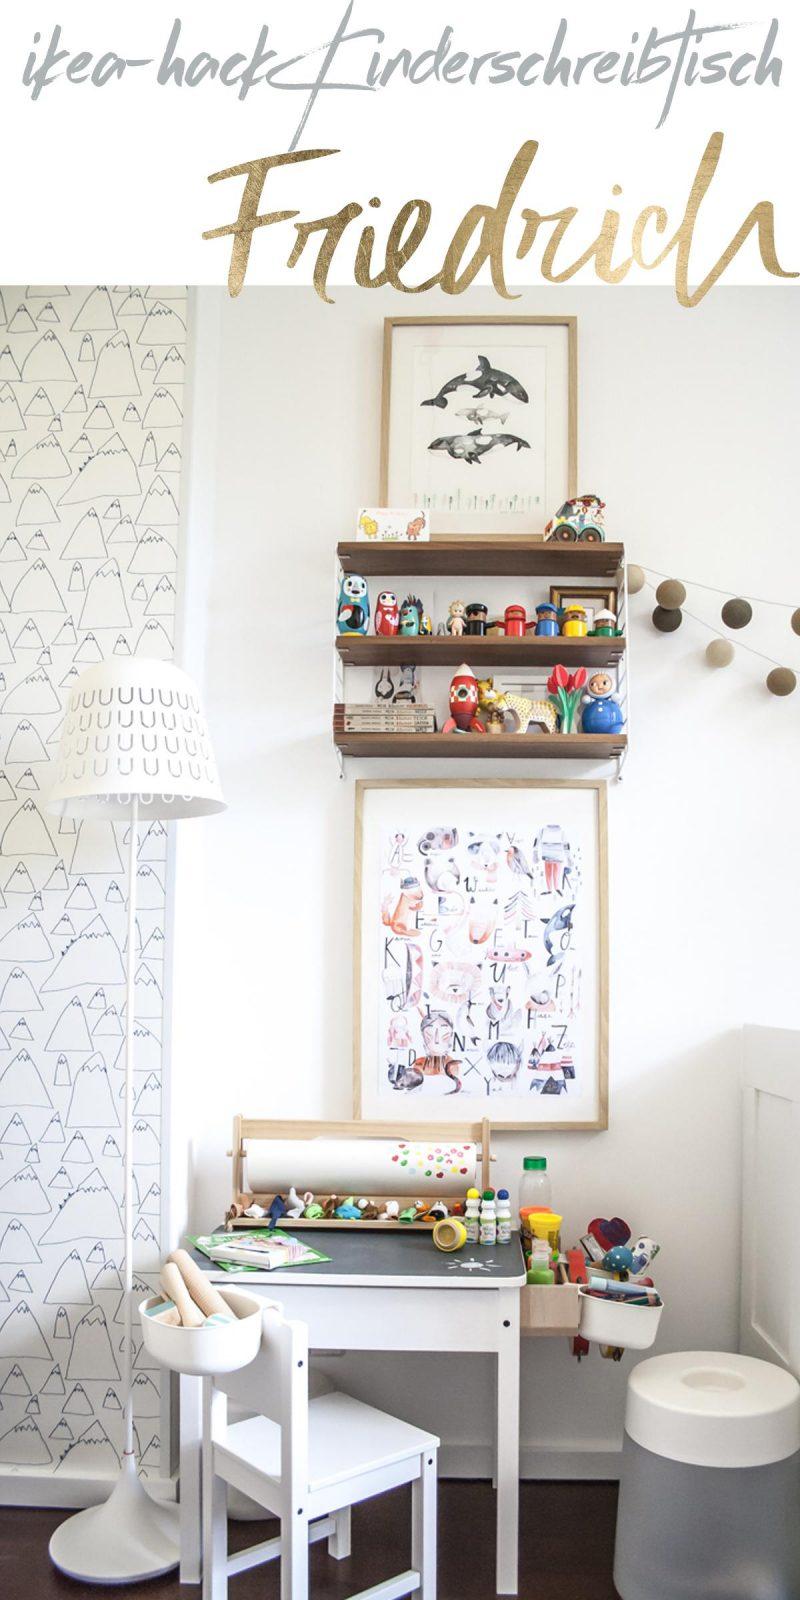 IKEA Hack: Friedrichs Erlebnisschreibtisch | Pinspiration